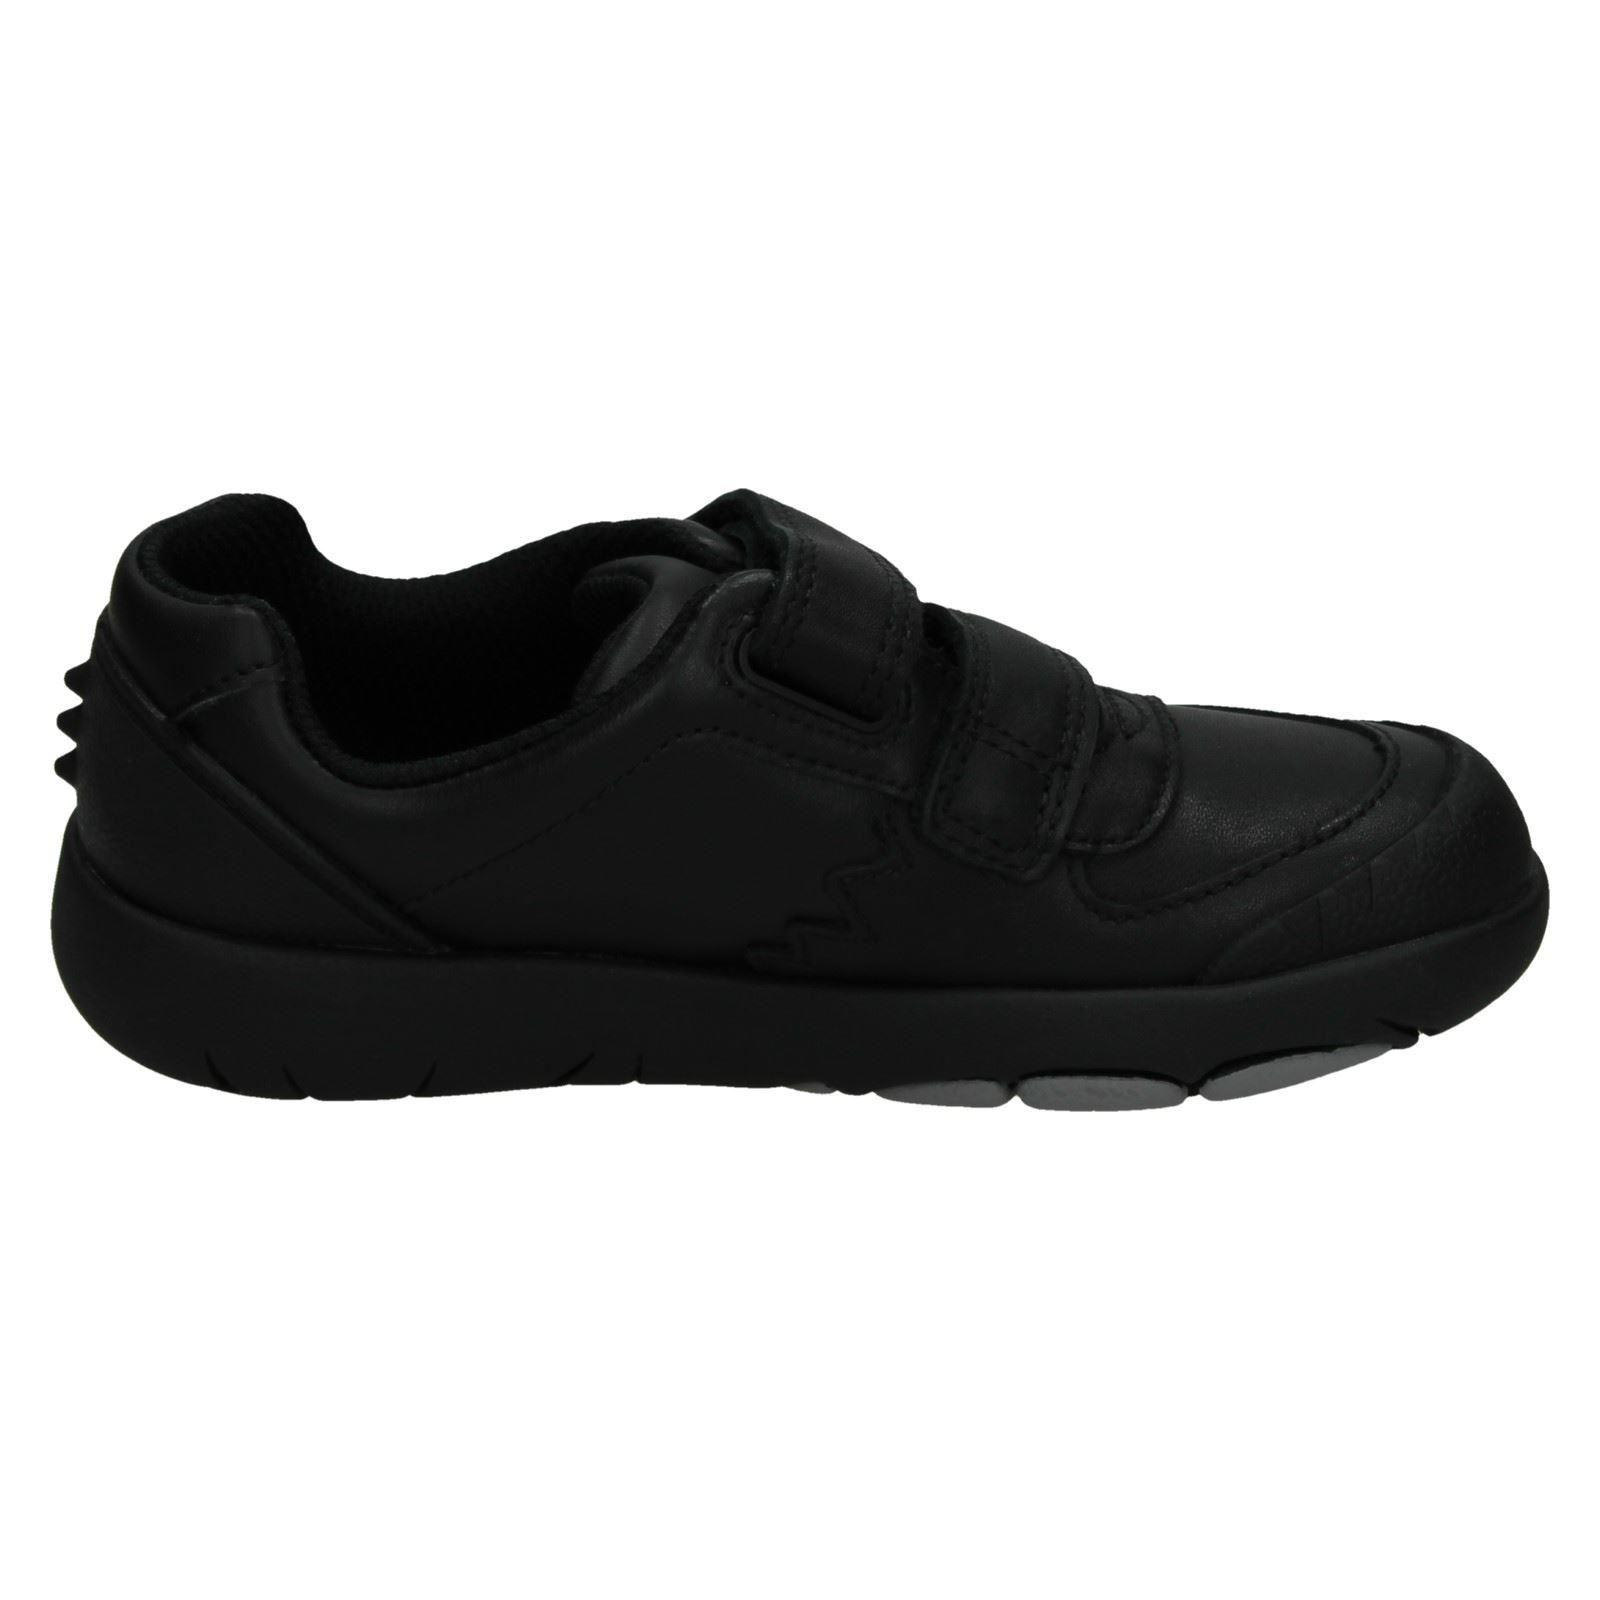 Boys Clarks Smart Formal School Shoes /'Rex Pace/'